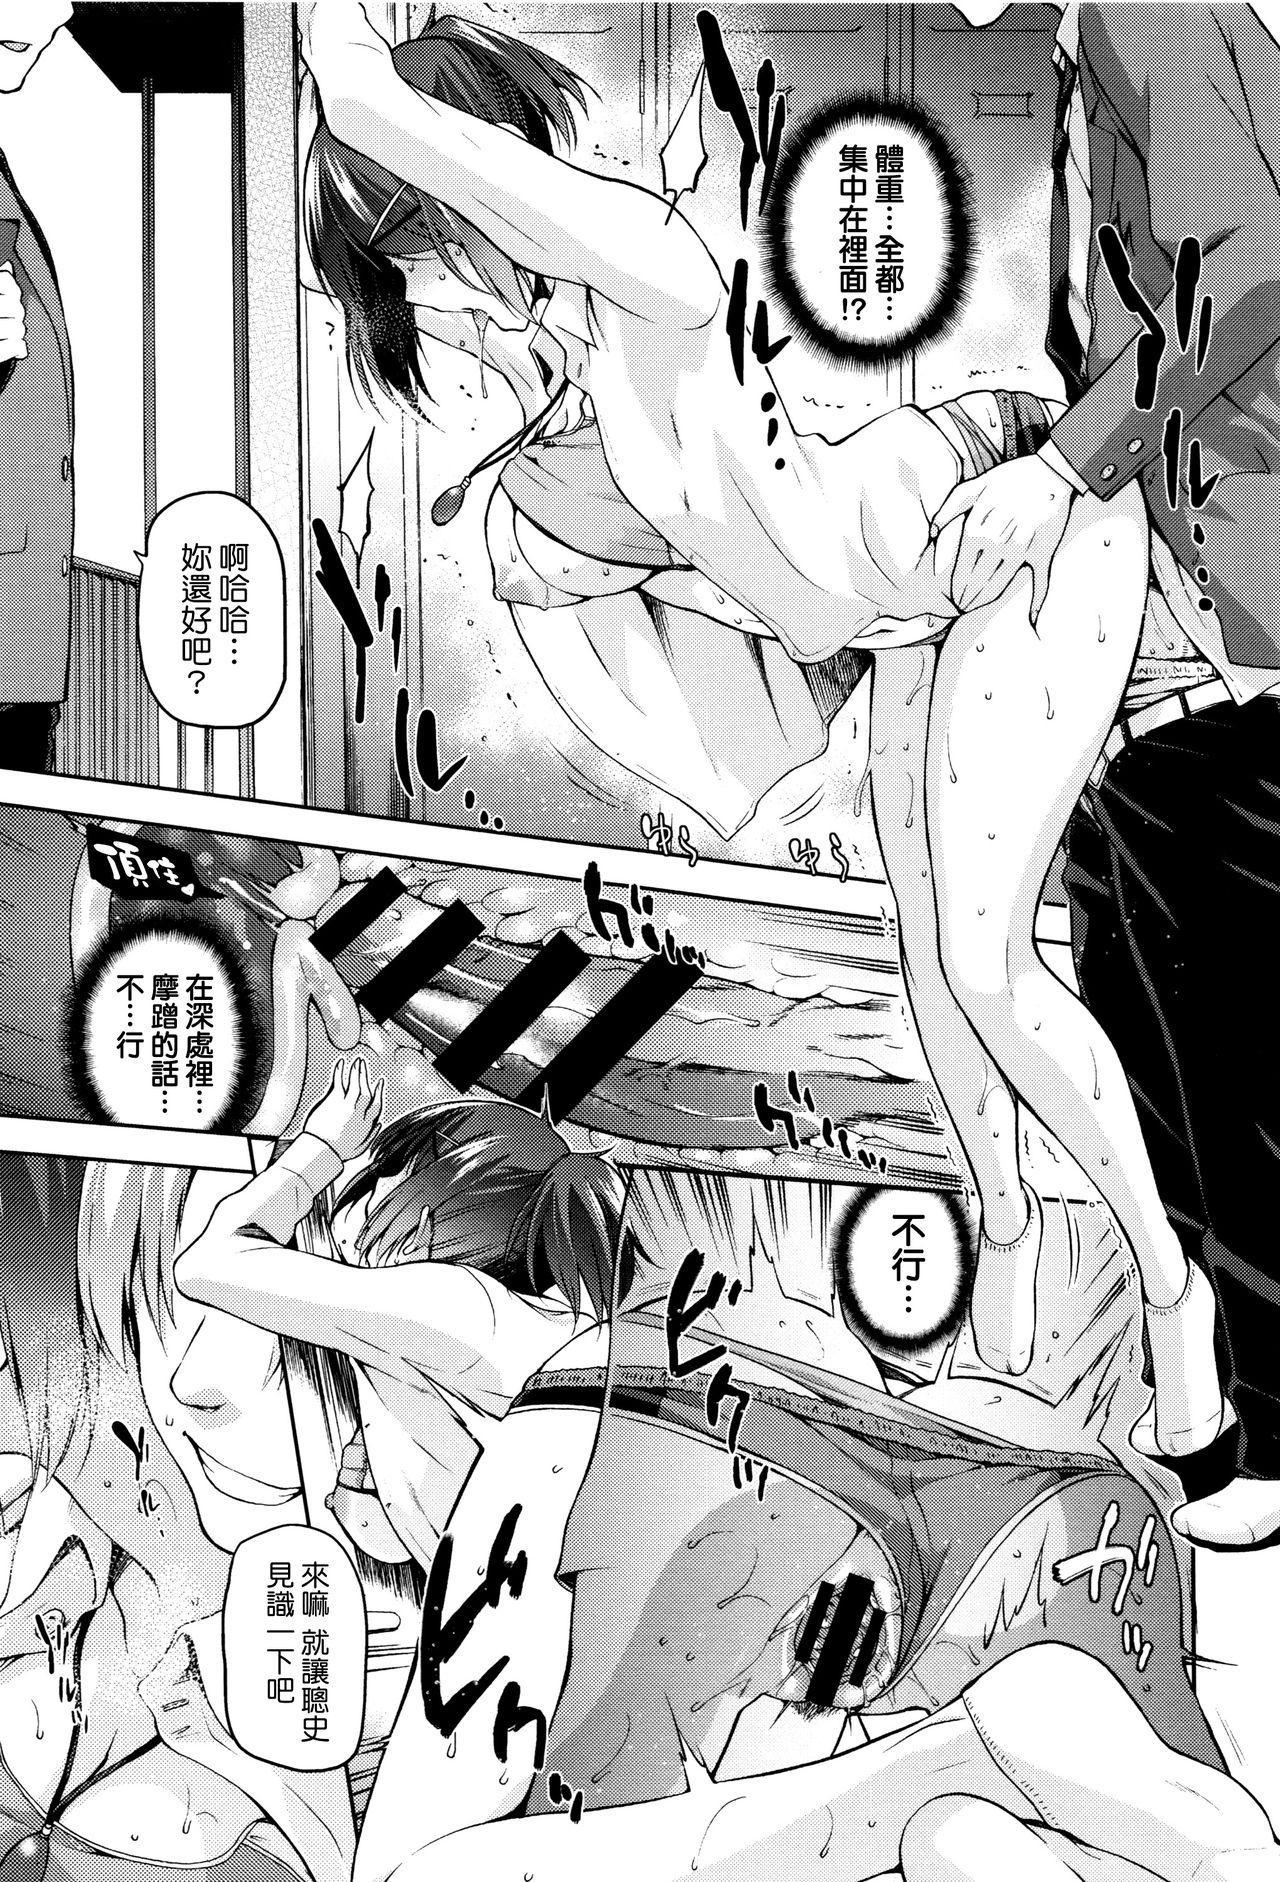 Hinata NTRism 40